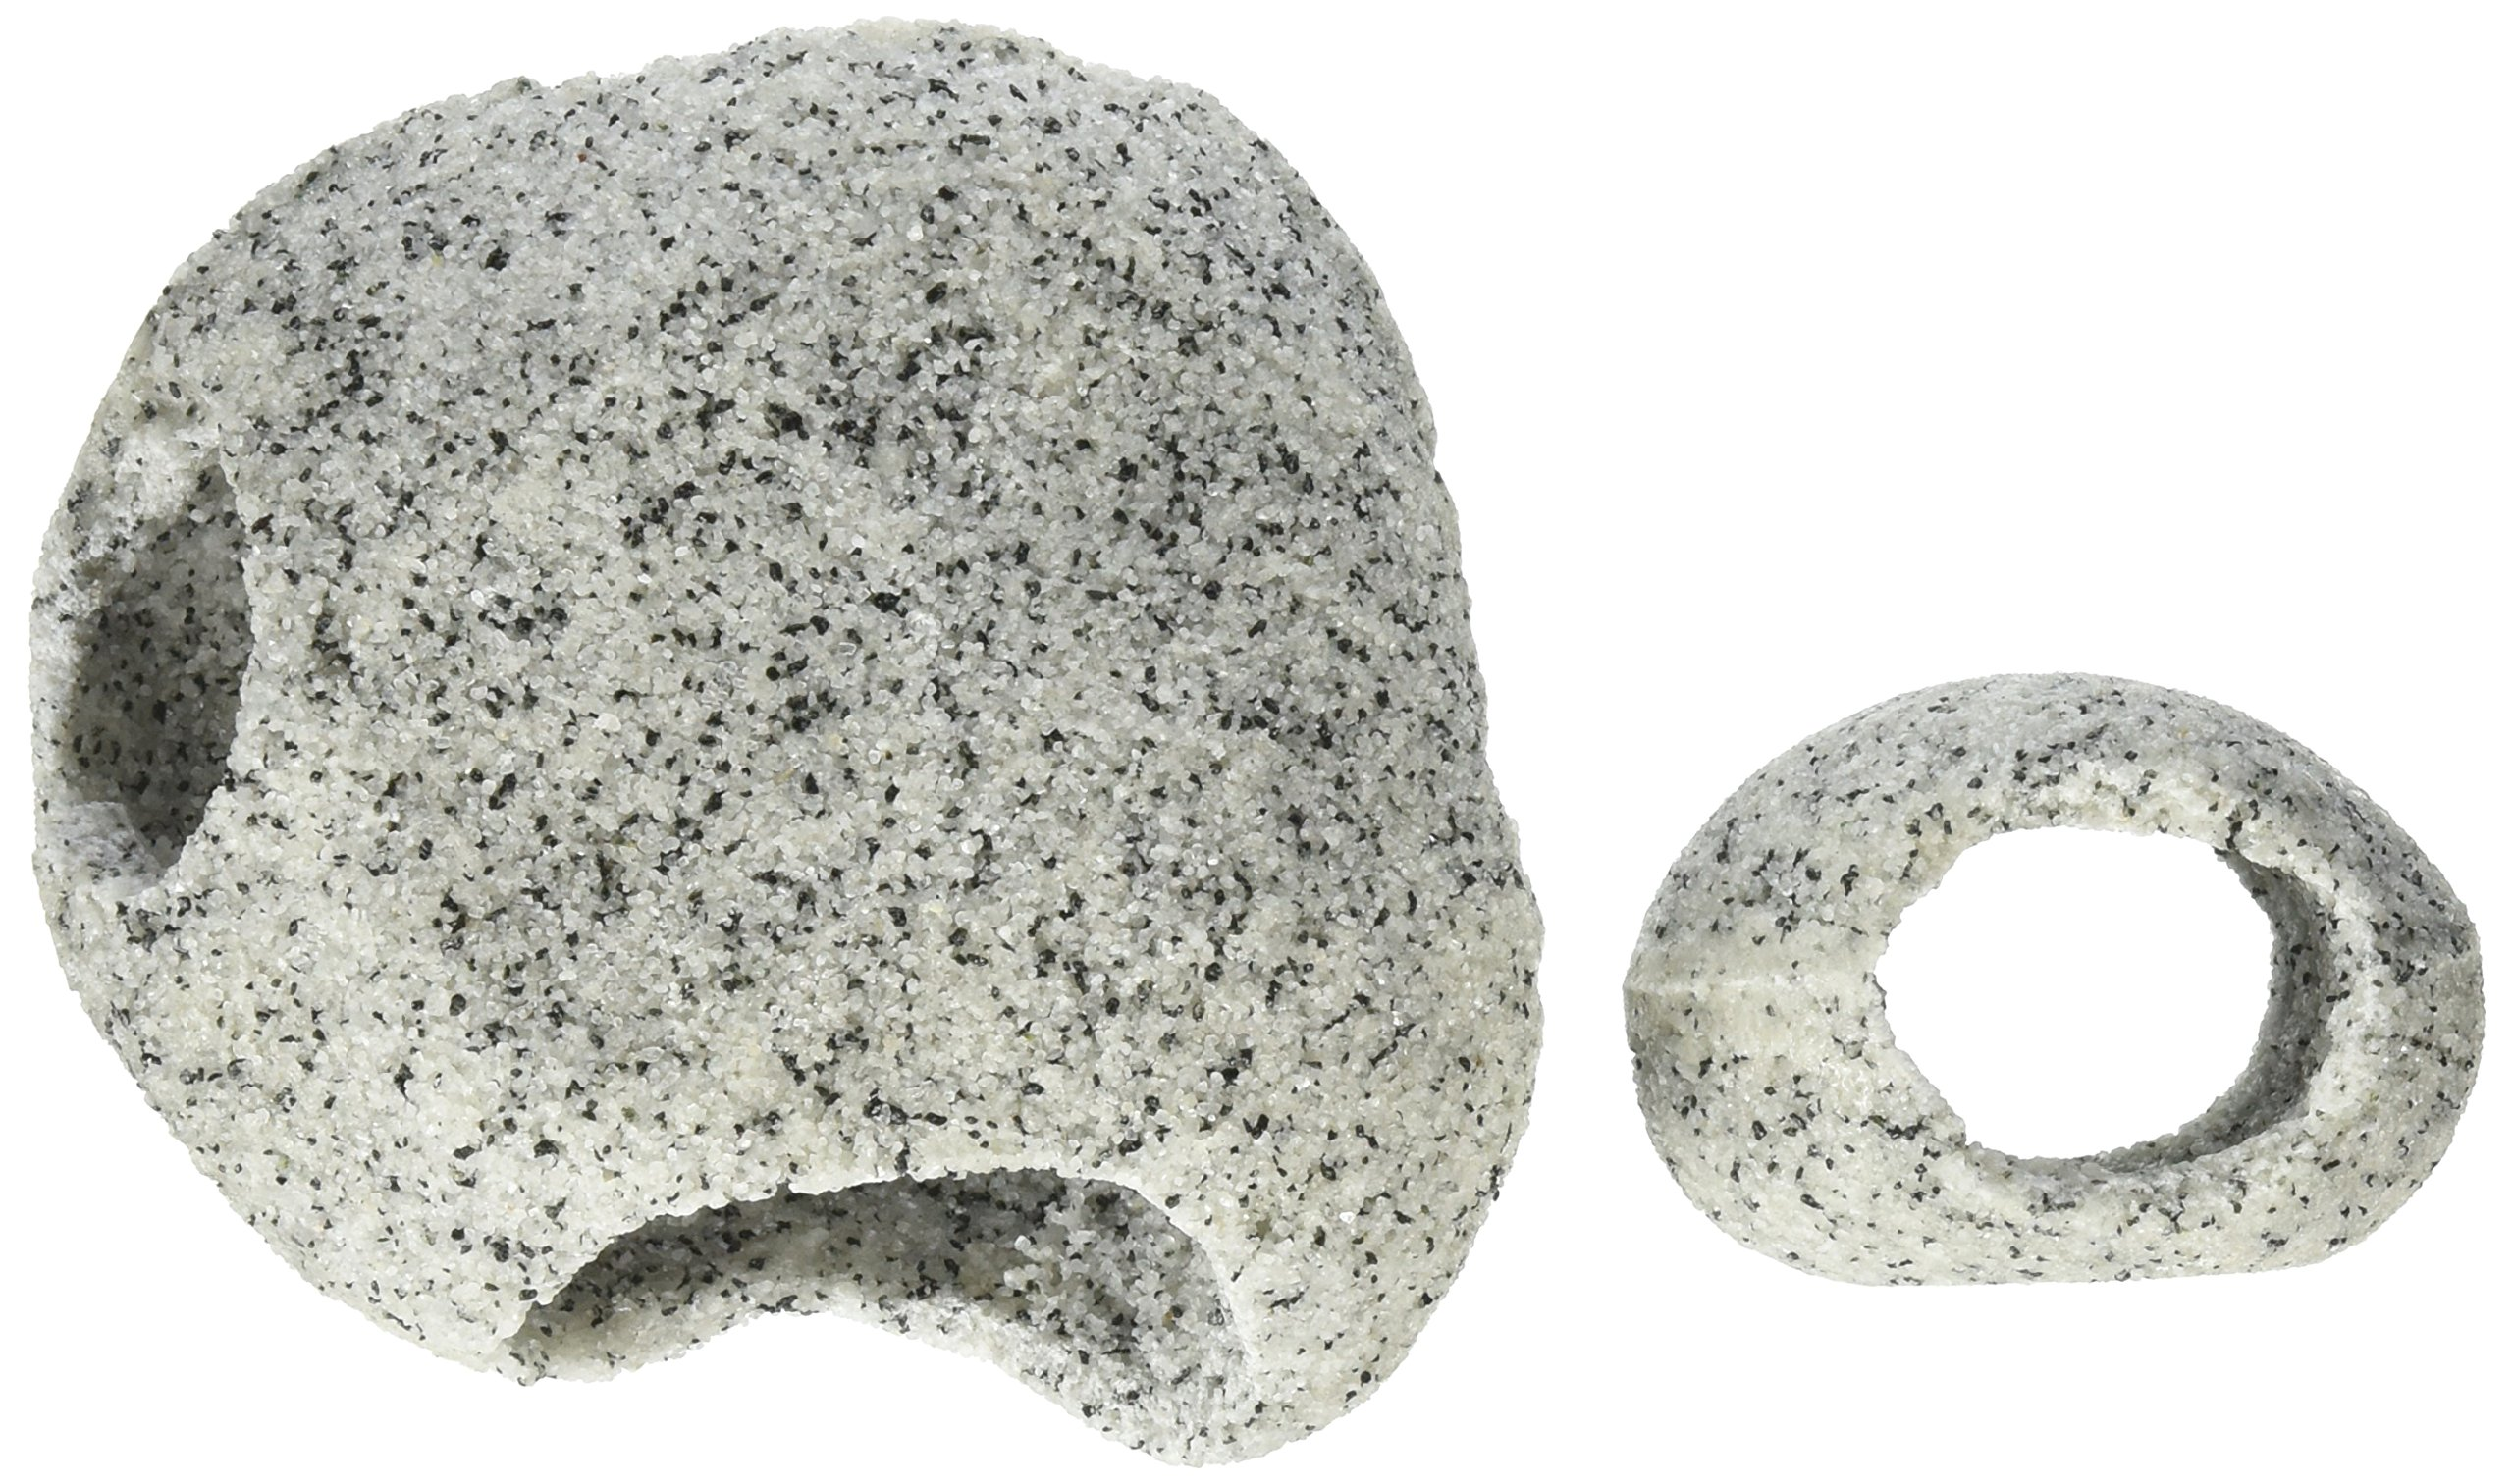 Penn Plax RR1074 Stone Replica Aquarium Decoration Realistic Granite Look with Fish Hideaway 2 Piece Set Size Small/Medium